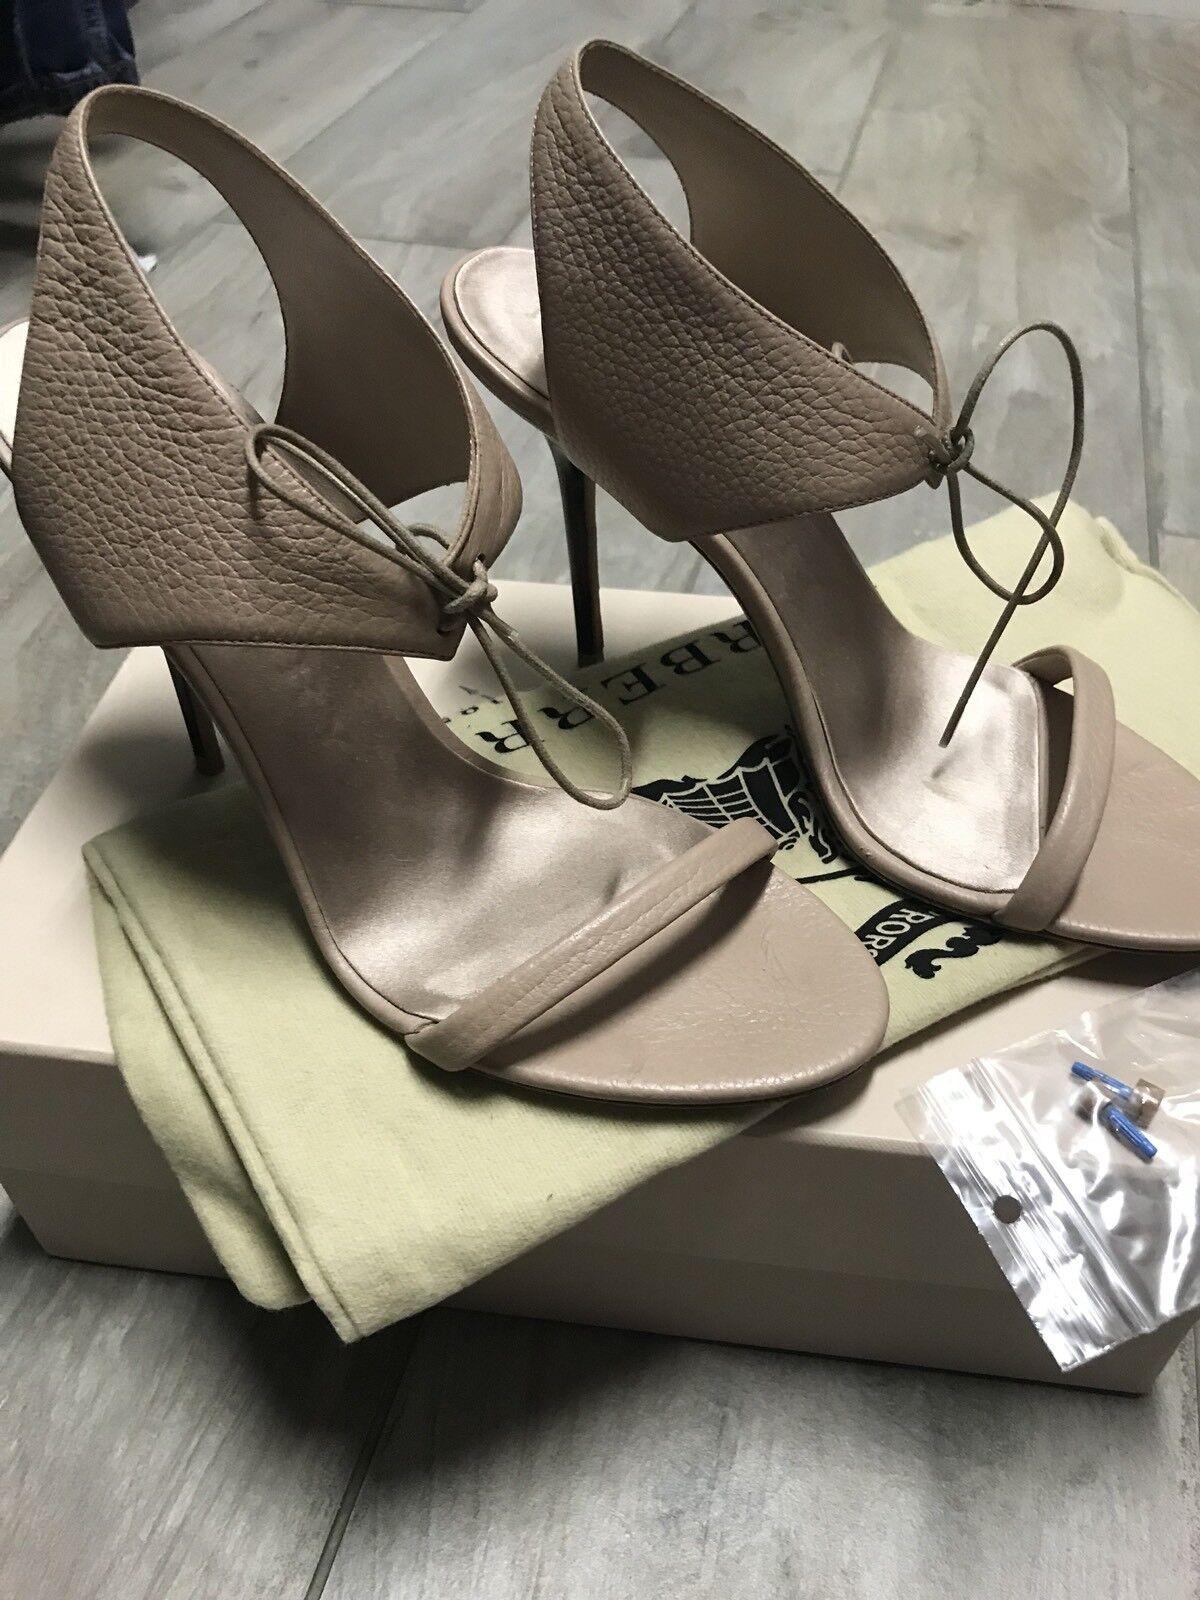 Burberry Askham Leatger Sandals Heels In Tan color Size39(fit Like 8-8.5)